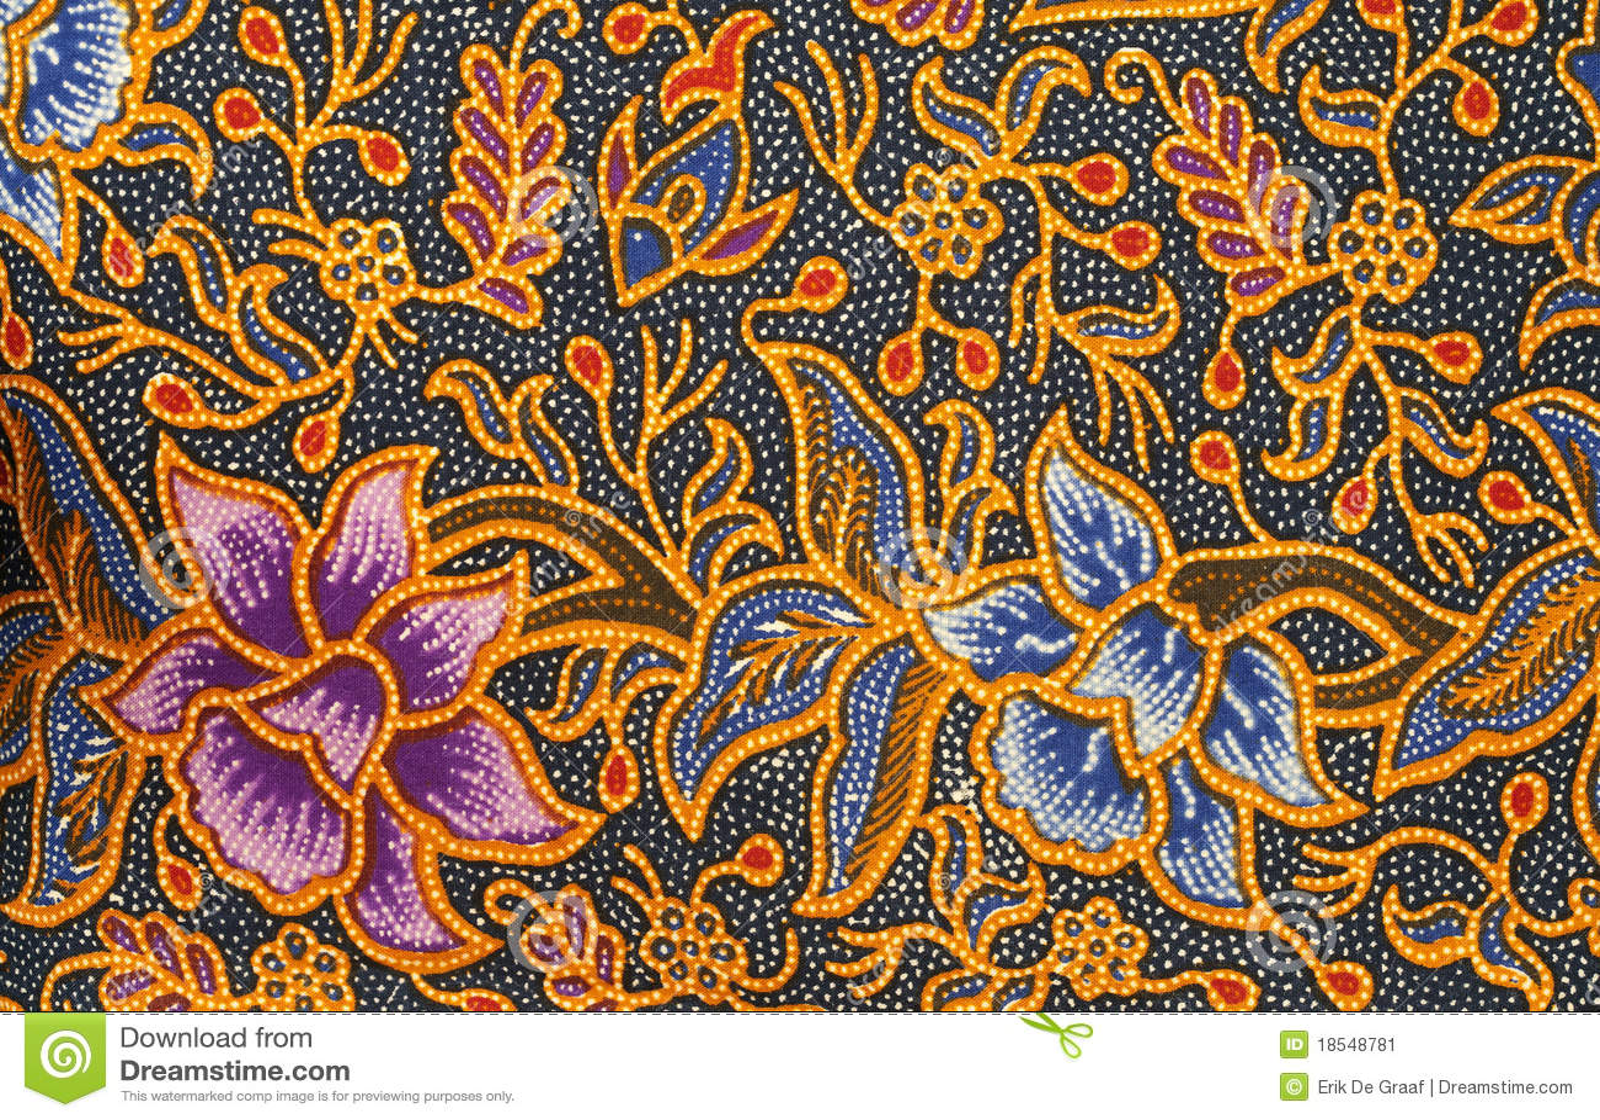 Batik Design Stock Image - Image: 18548781